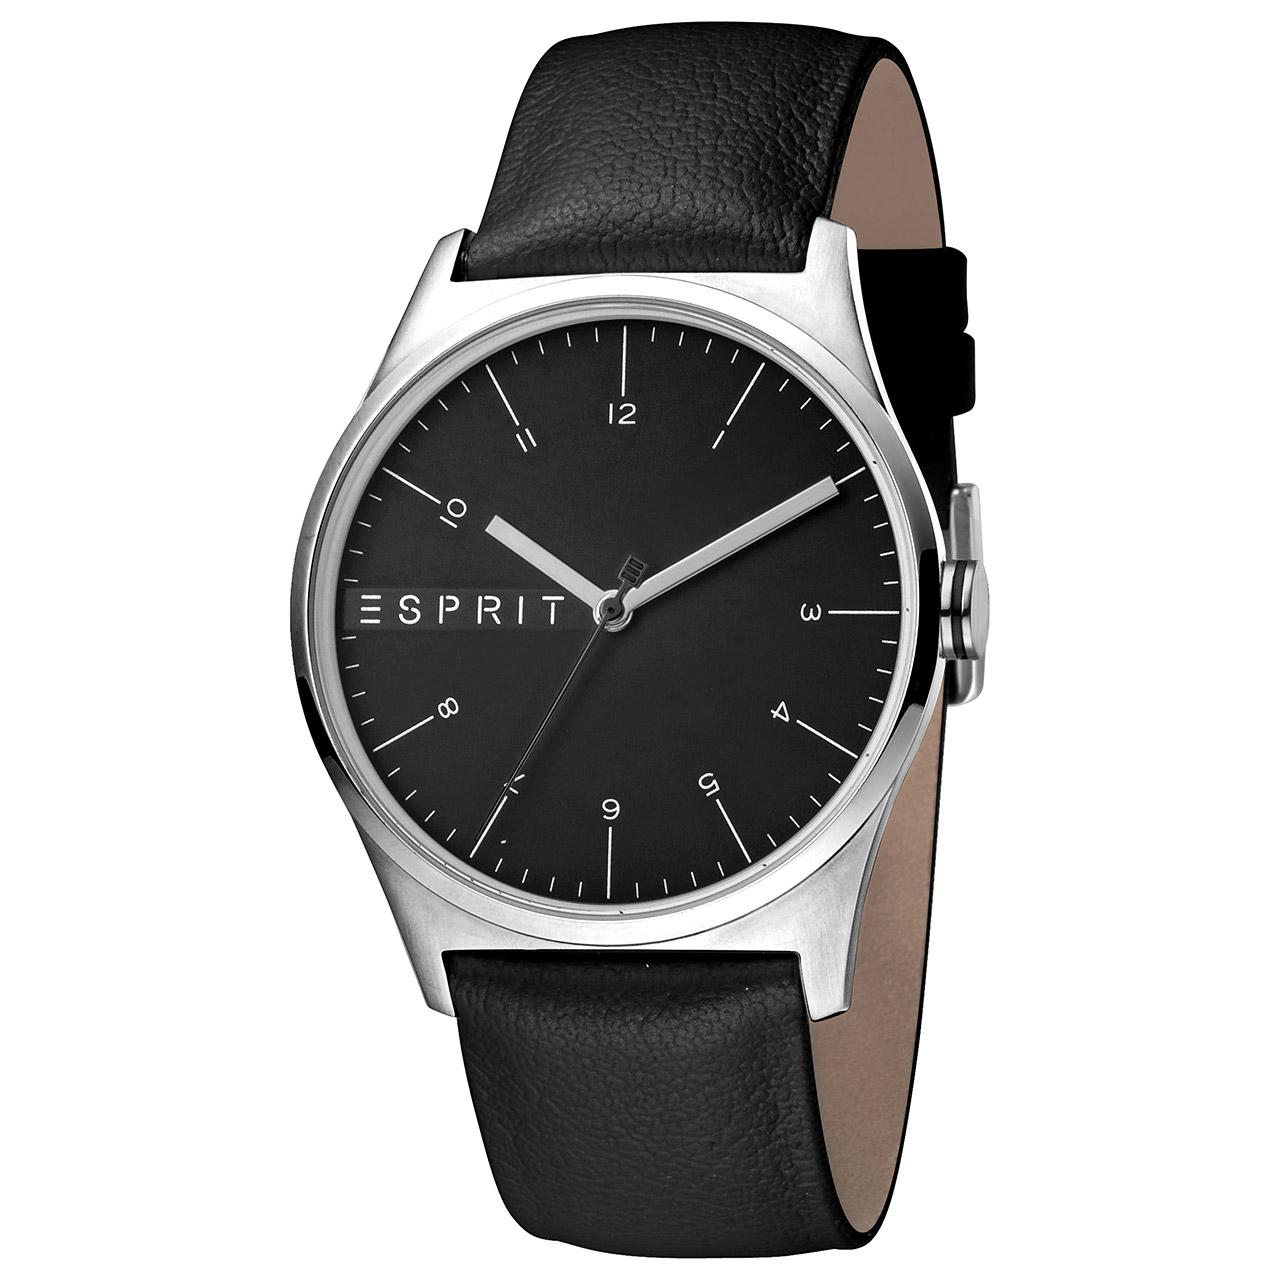 ساعت مچی عقربه ای مردانه اسپریت مدل ES1G034L0025 22